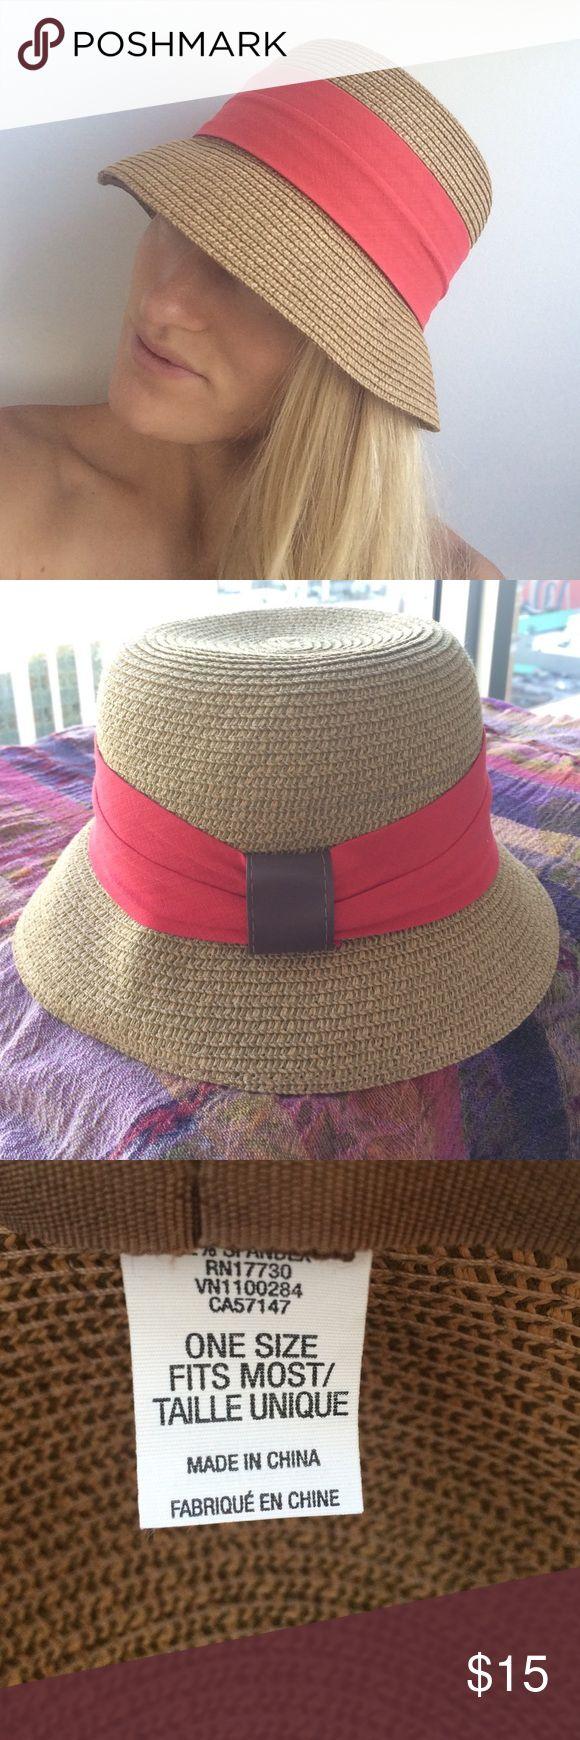 Women's sun hat Short brimmed beach or brunch ready sun hat. Wore it only twice. Accessories Hats